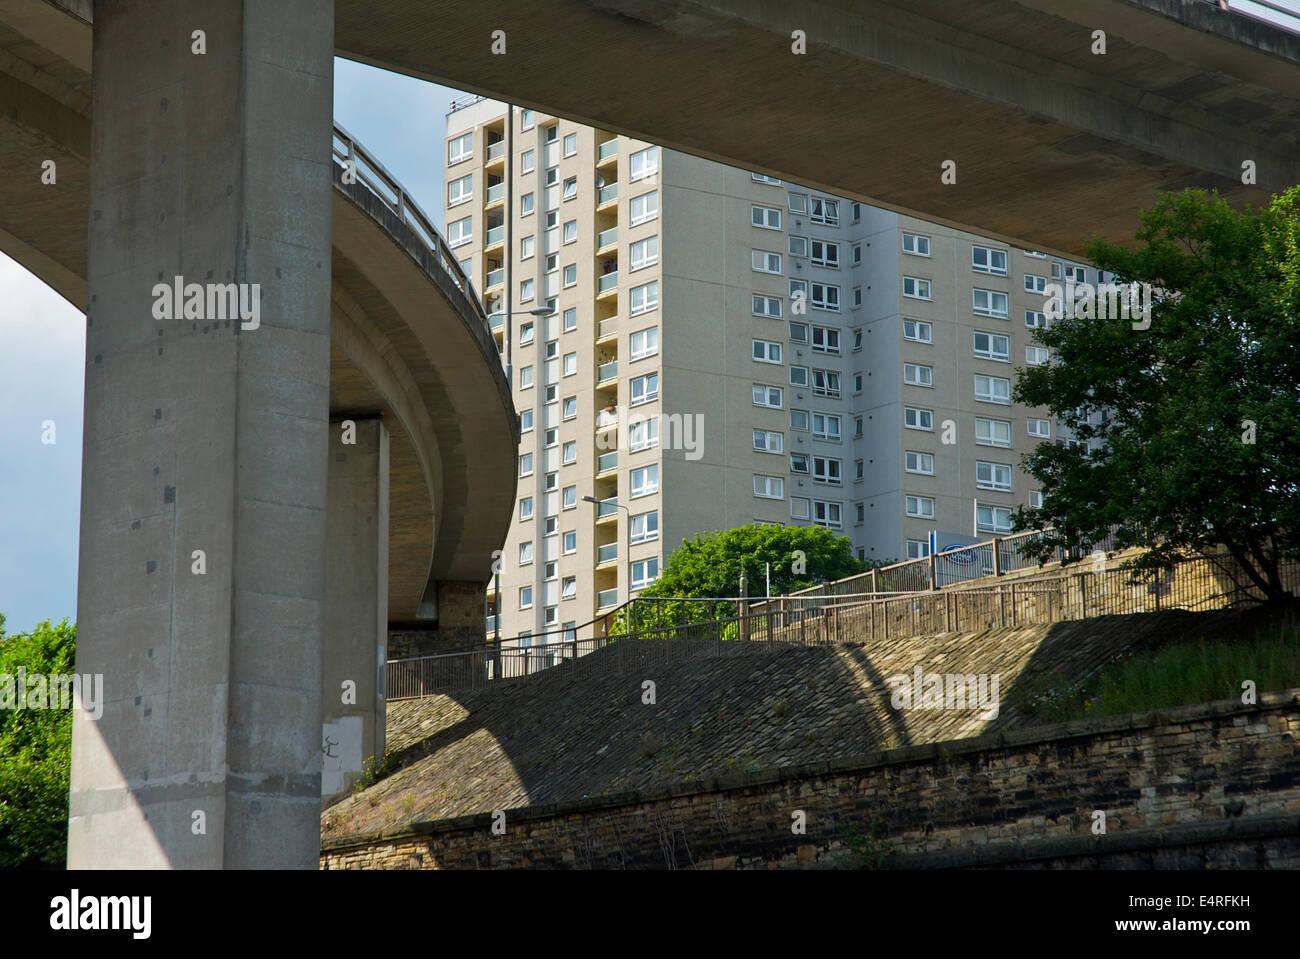 North Bridge and high-rise flats, Halifax, West Yorkshire, England UK - Stock Image